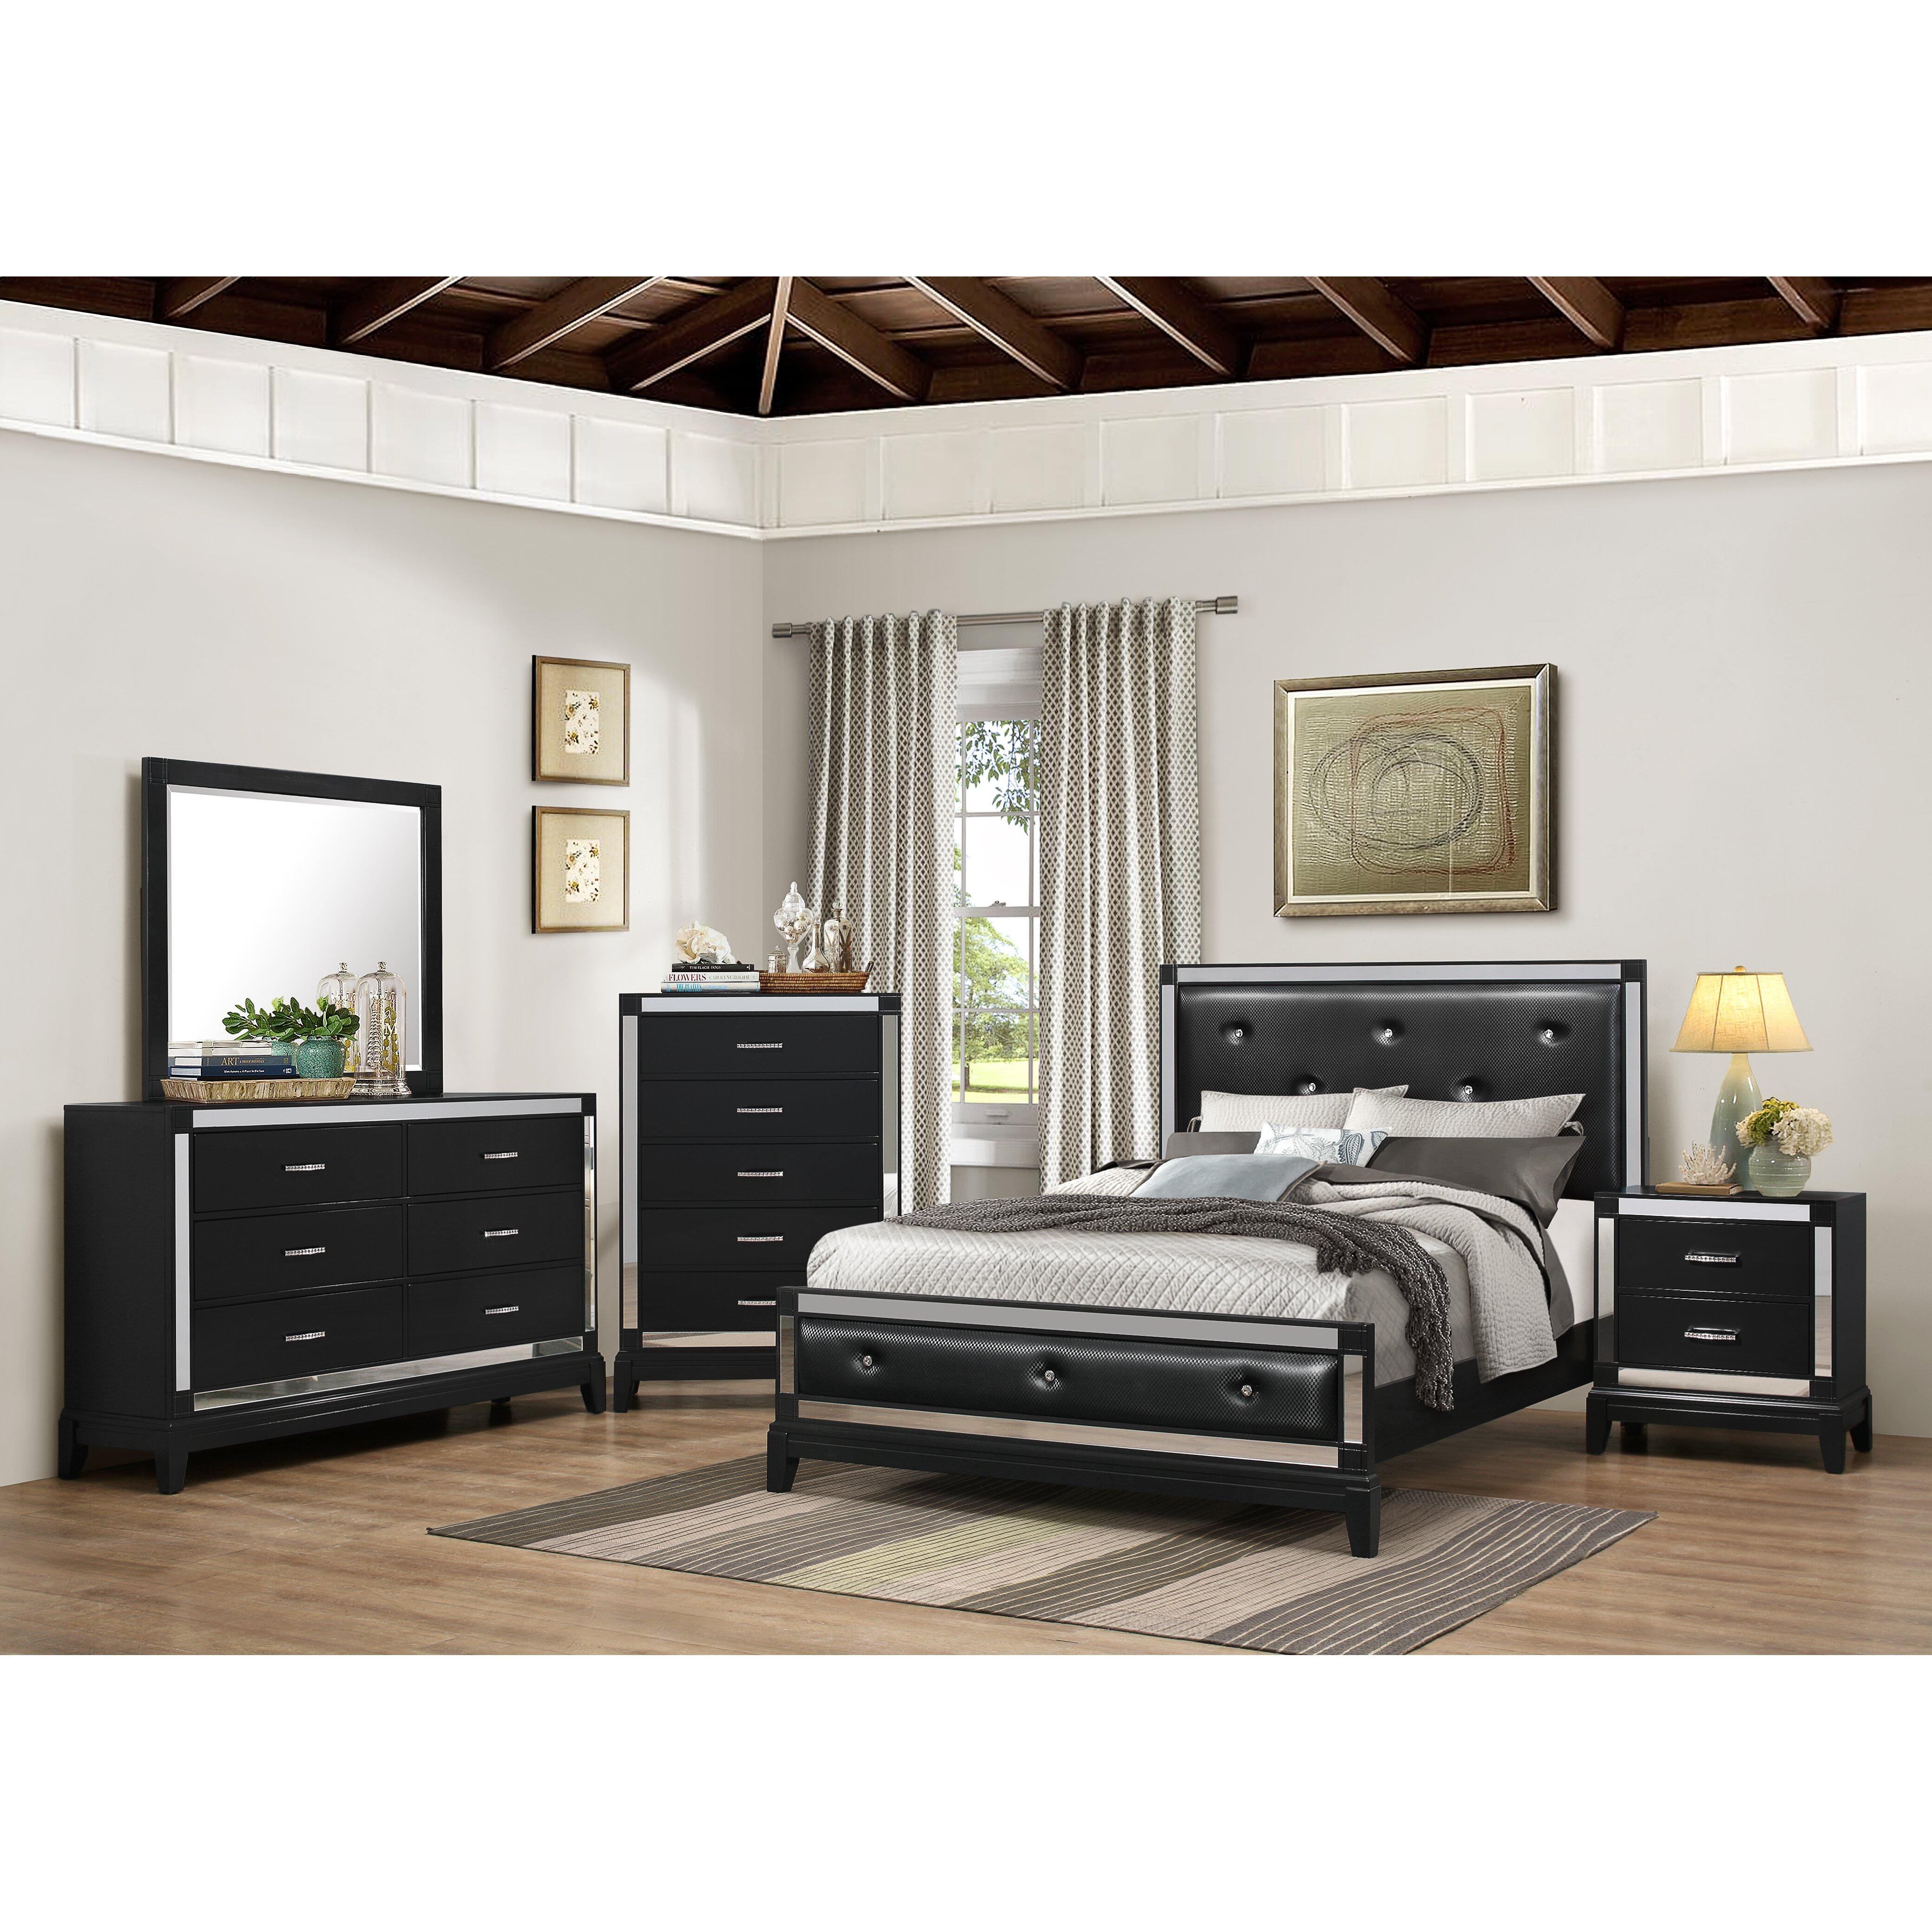 Simmons Bedroom Furniture House Of Hampton Simmons Casegoods Smethwick Panel Customizable